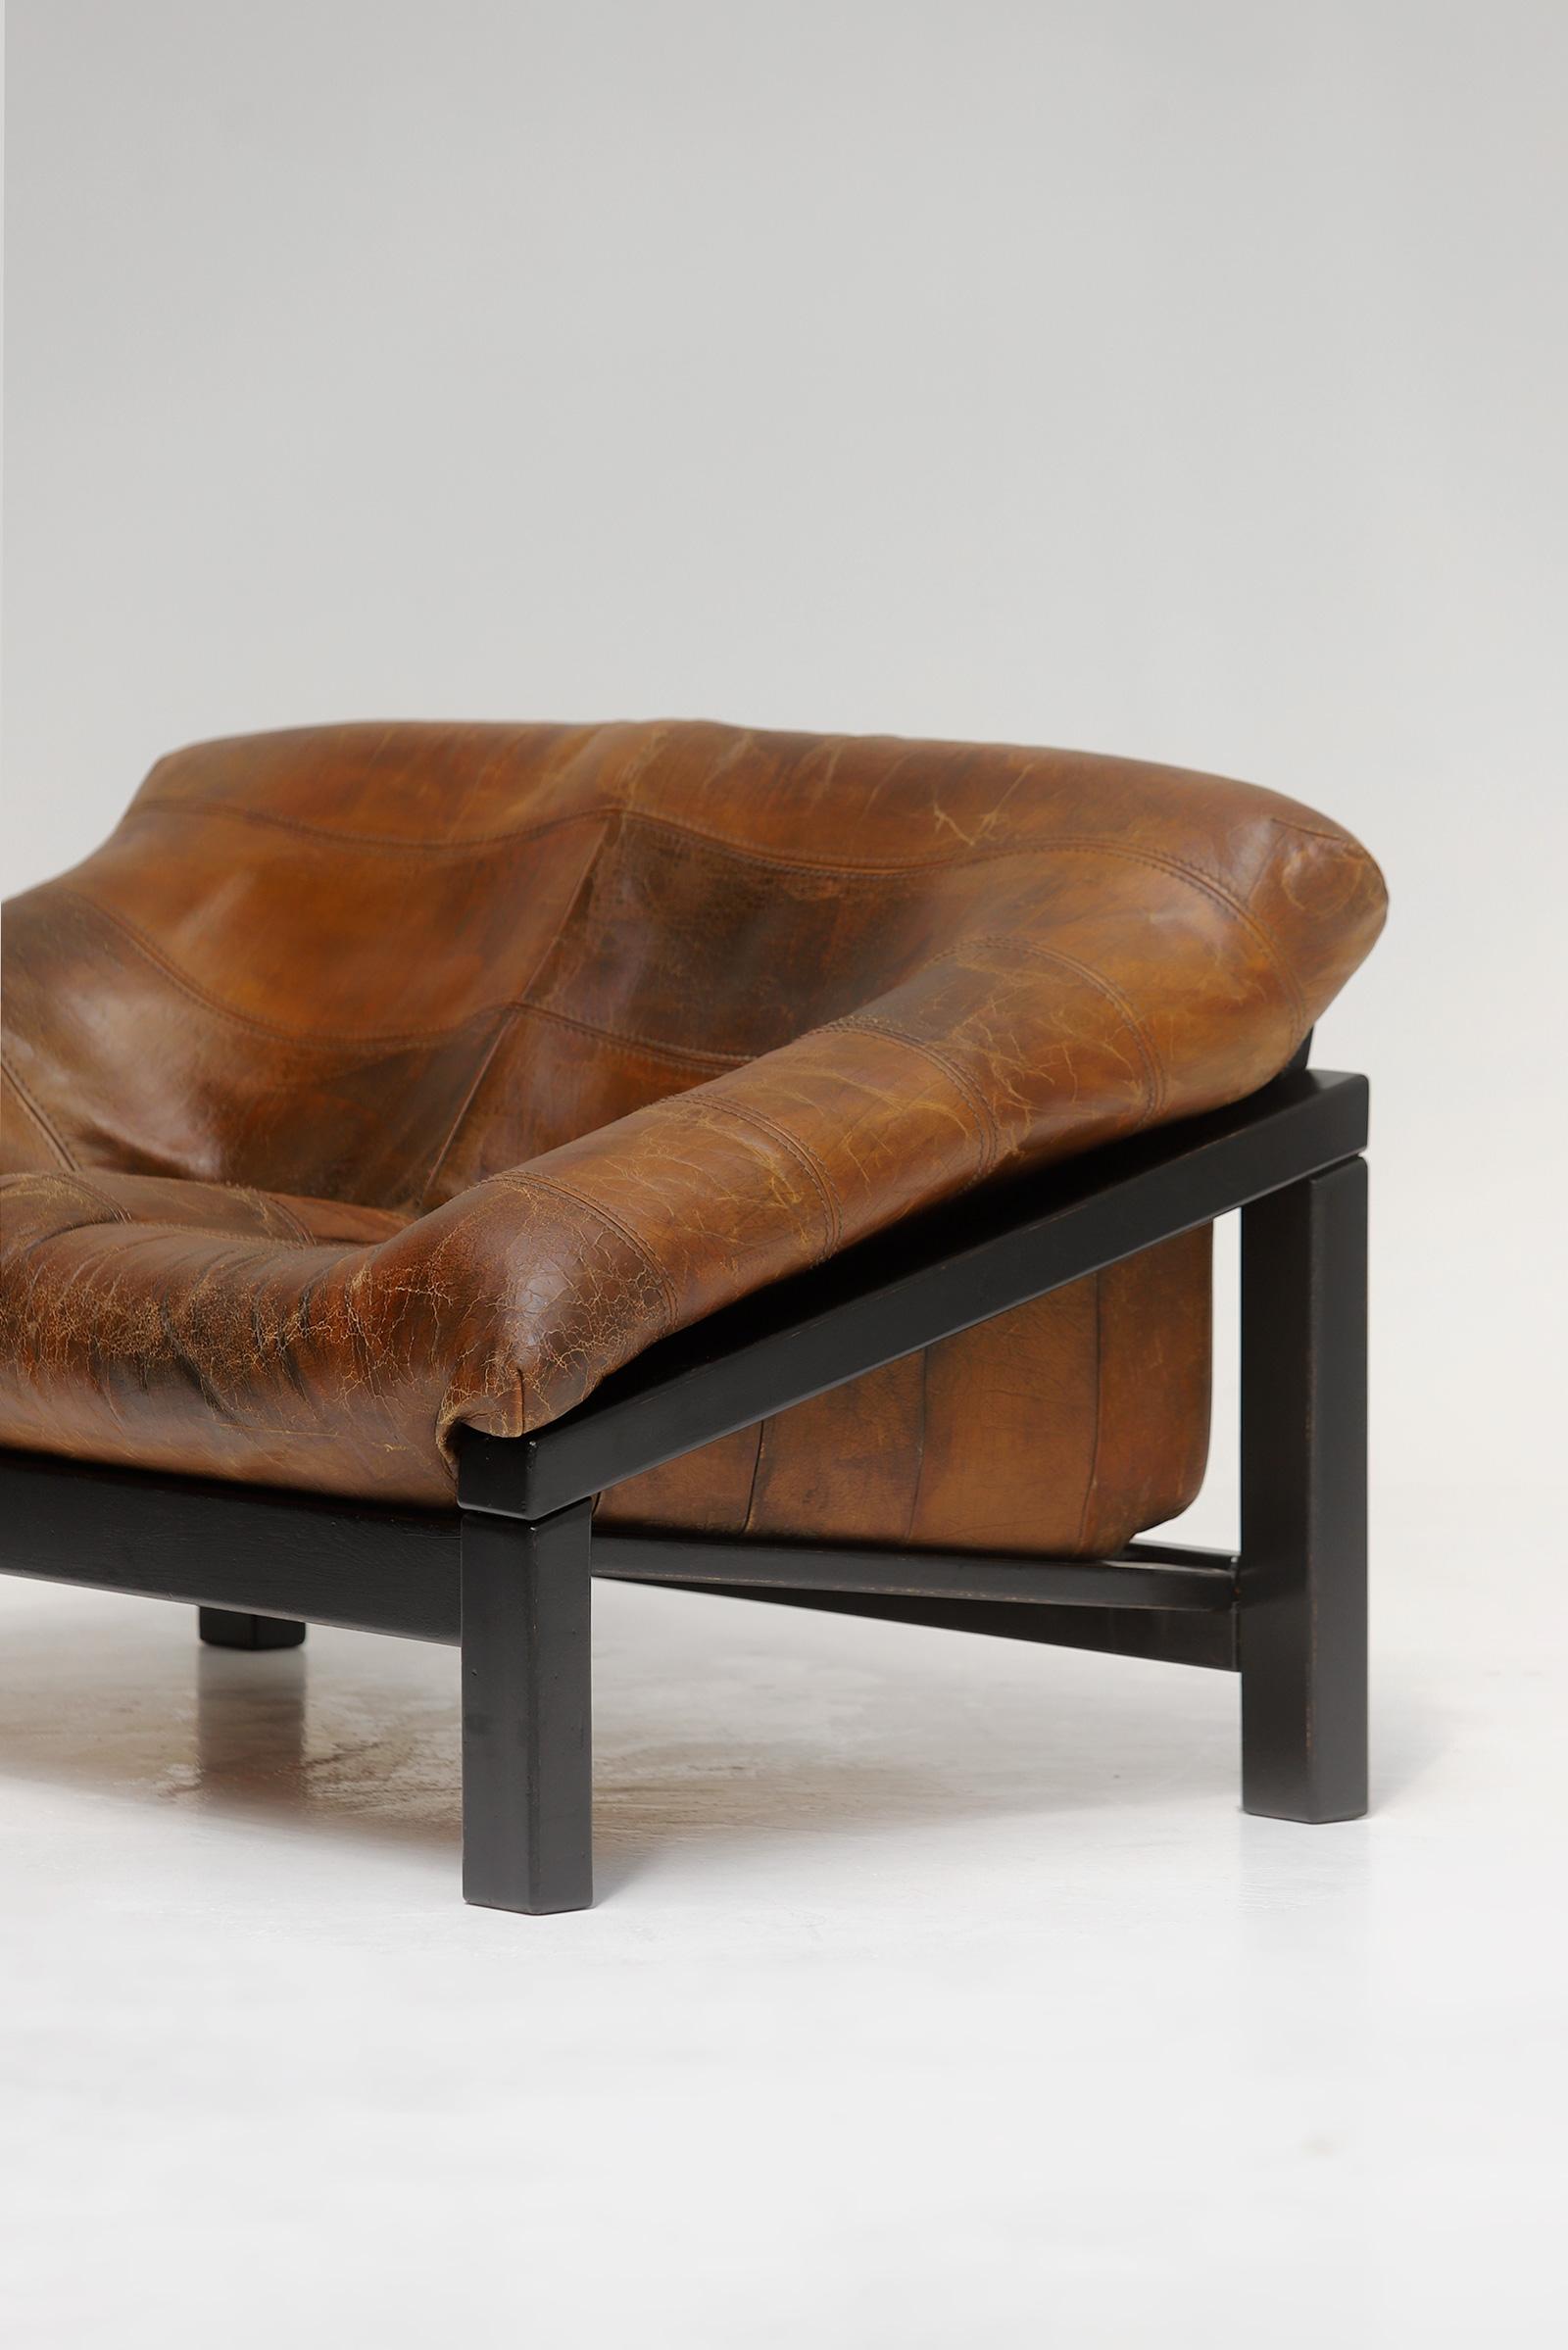 Decorative 2 seat leather Sofaimage 4